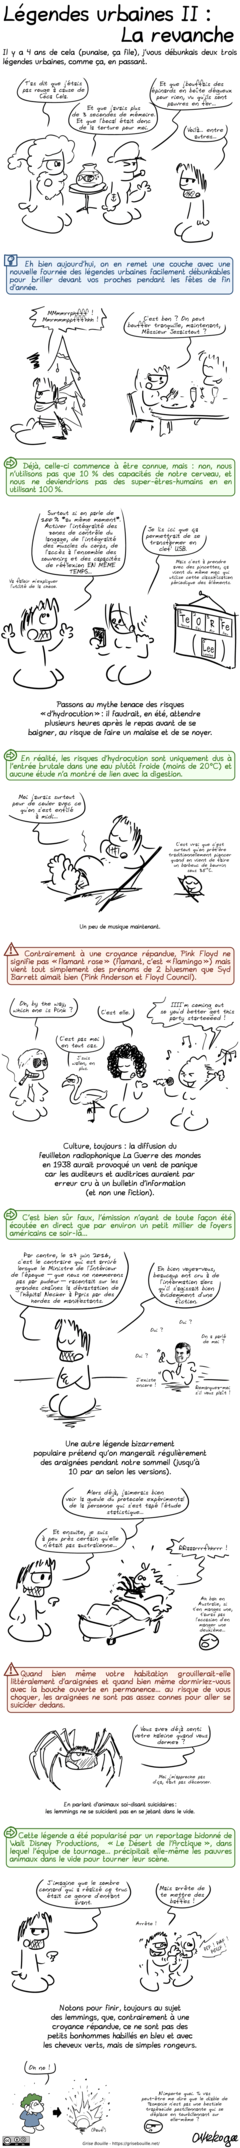 Légendes urbaines II : La revanche